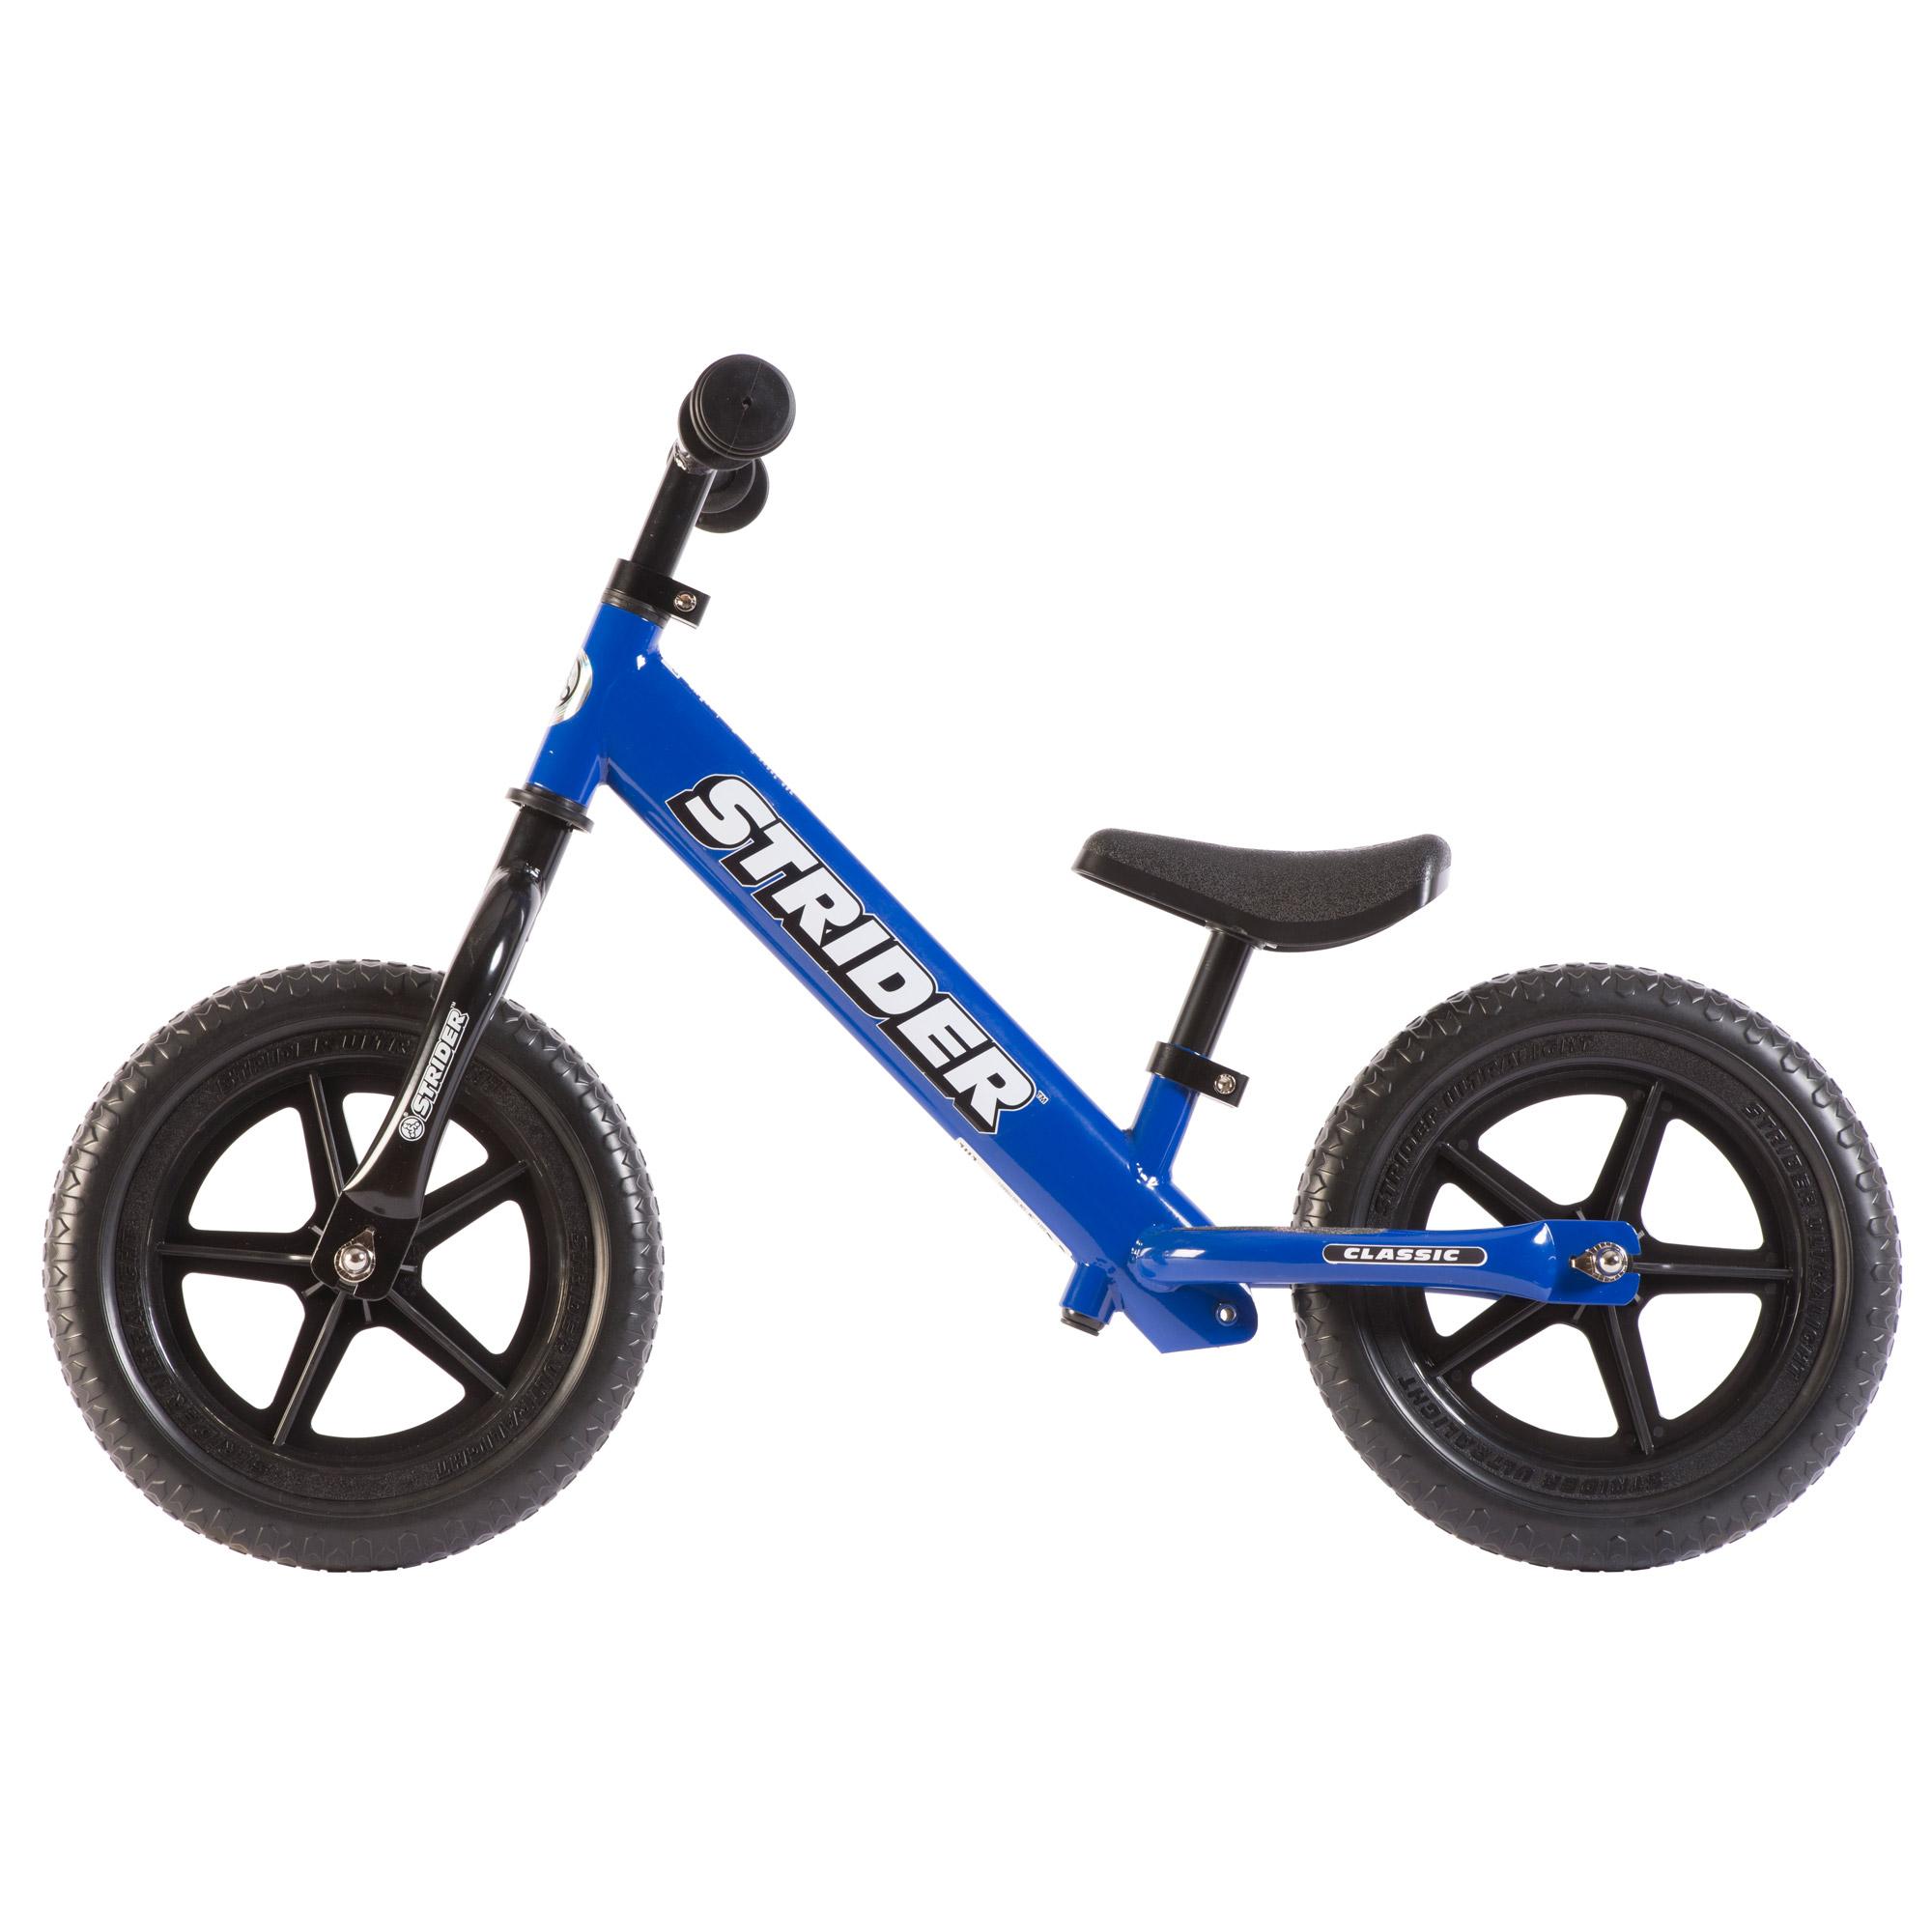 Details about Strider 12 Classic Entry Balance Bike for Toddler 18 - 36 Month, Blue + Ski Set